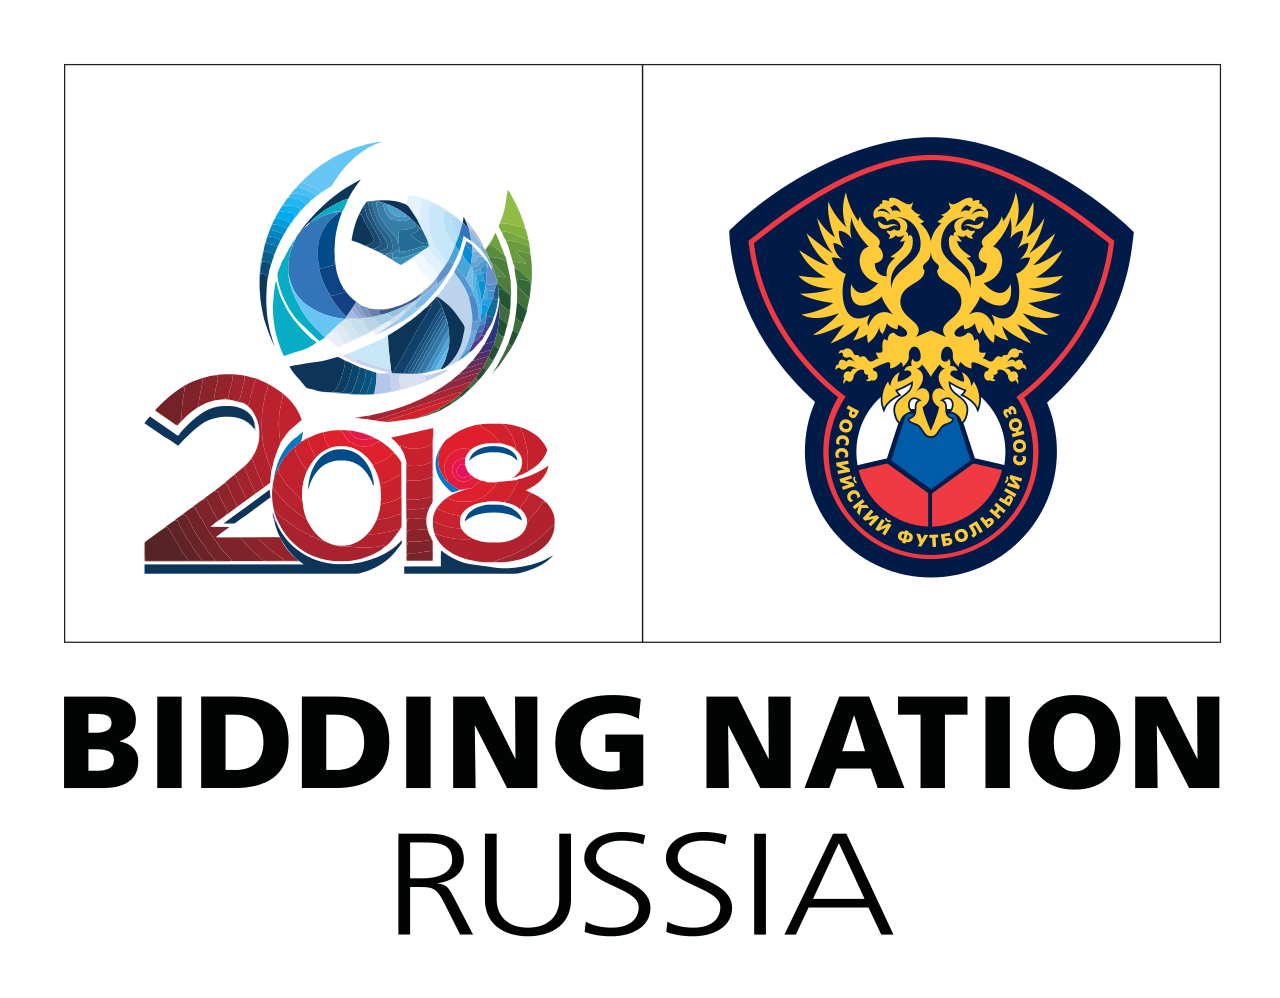 File:Russia 2018 FIFA World Cup Bid Logo.svg - Logo Fifa World Cup - Fifa World Cup 2018 Vector PNG